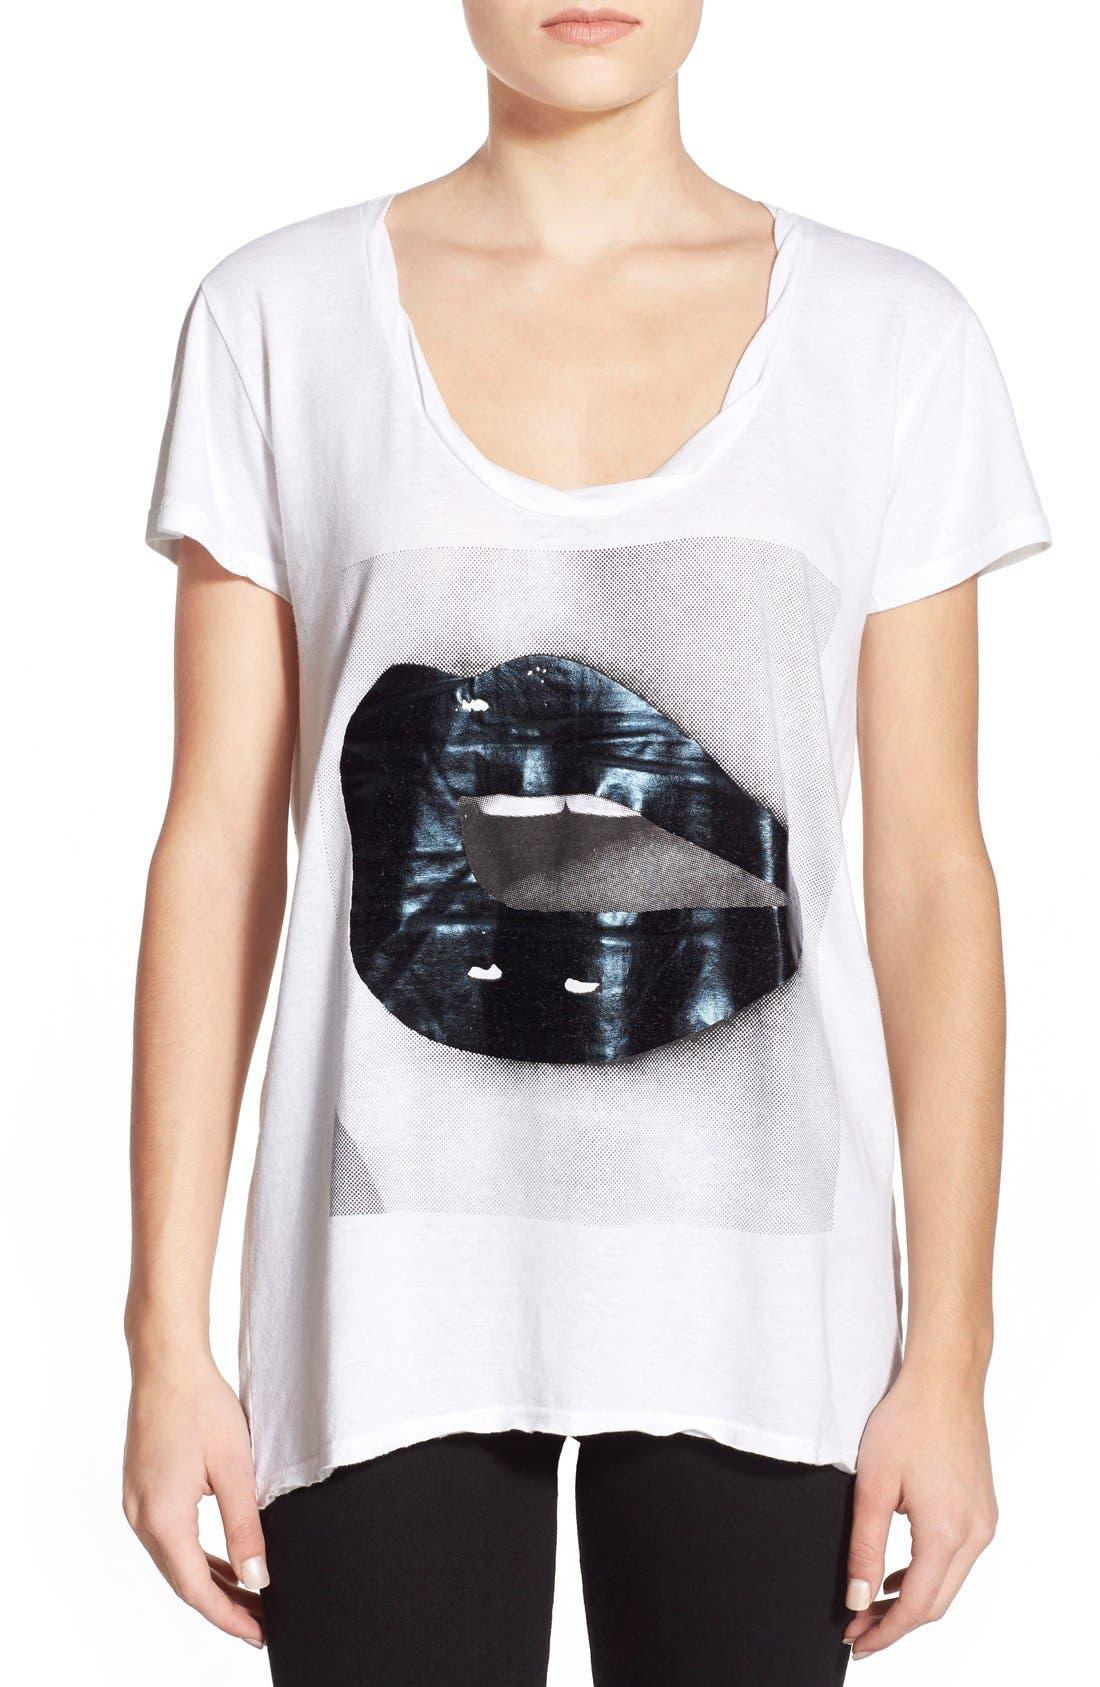 Alternate Image 1 Selected - Pam & Gela'Sophie' Graphic Tee